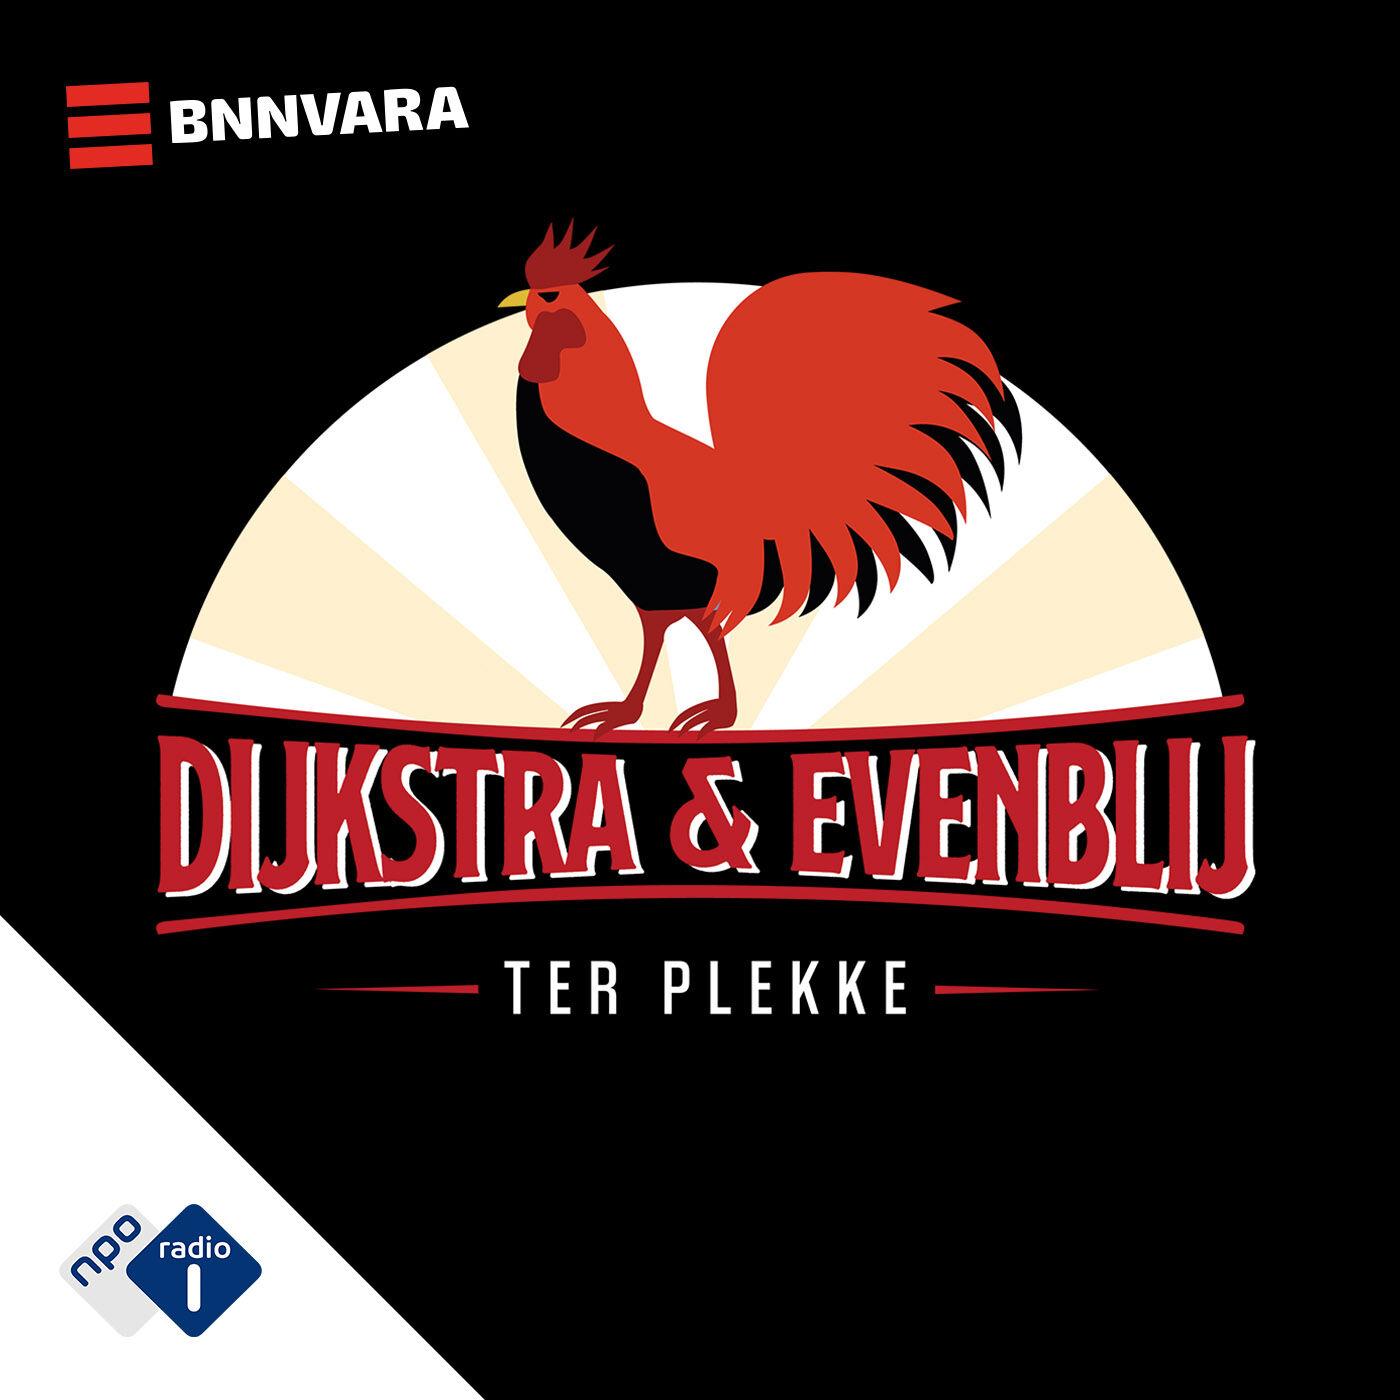 Dijkstra en Evenblij ter plekke logo